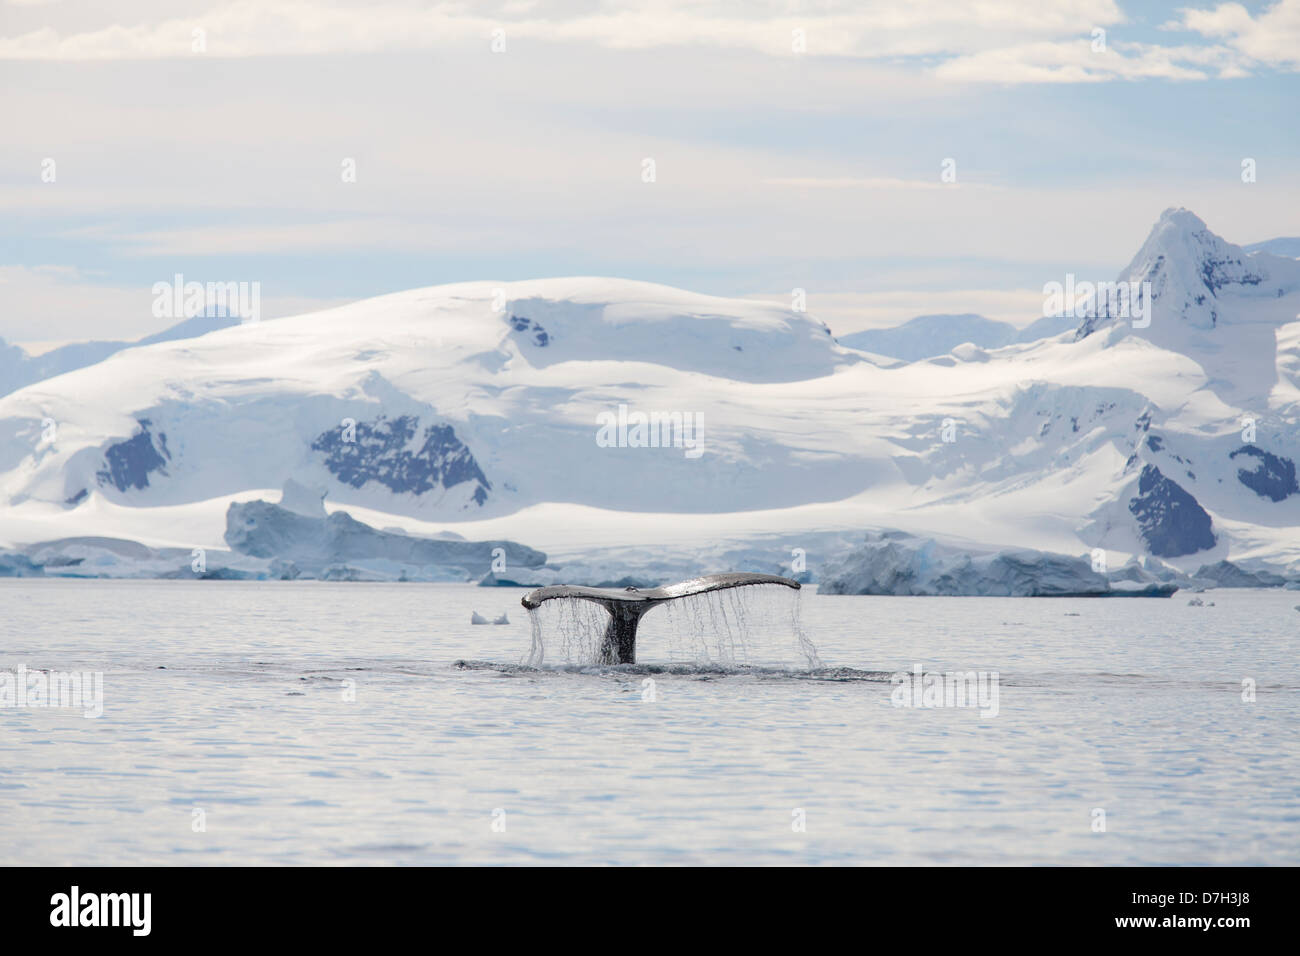 Humpback whale (Megaptera novaeangliae), Paradise Bay, Antarctica. - Stock Image